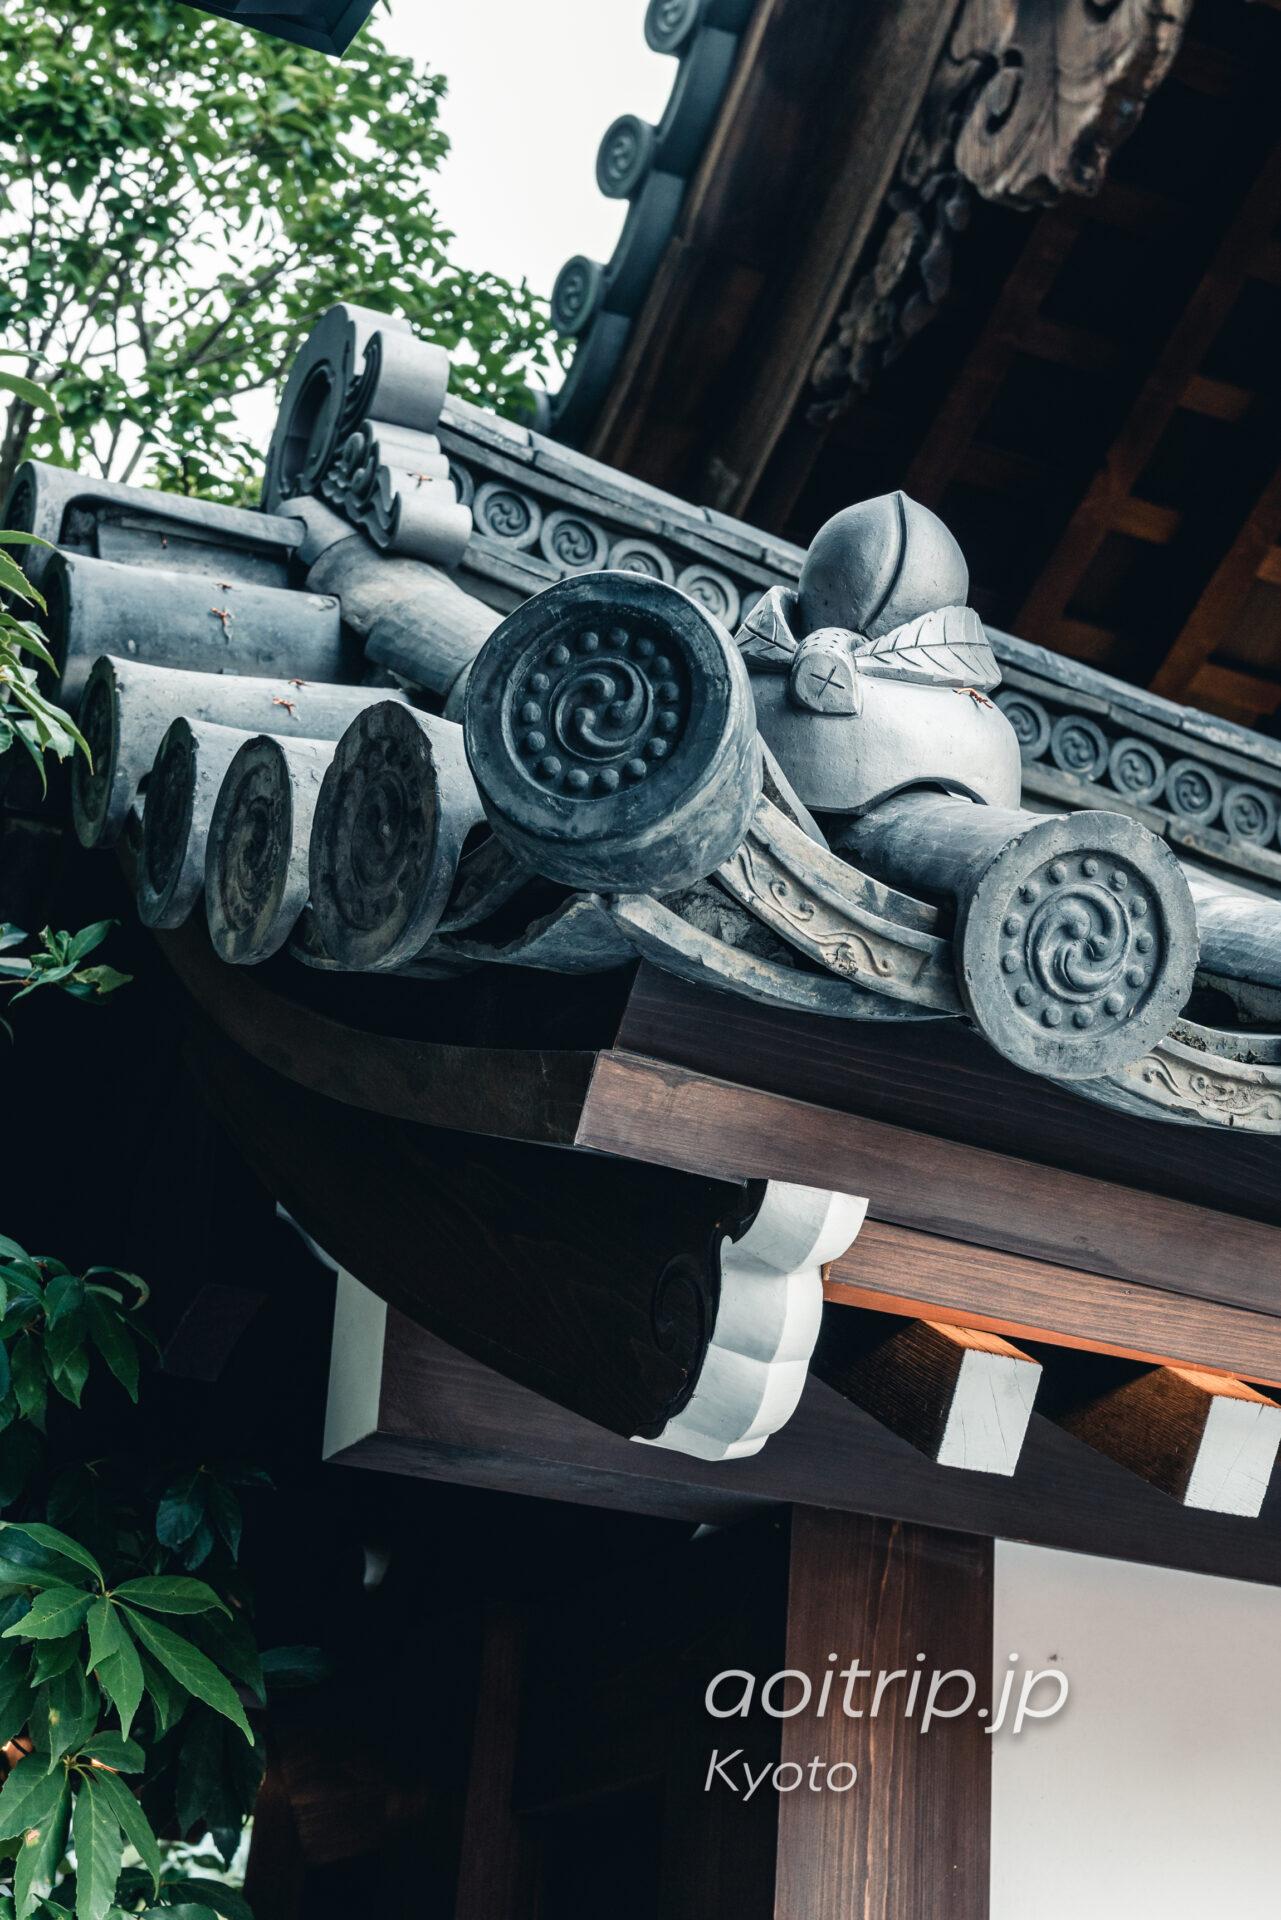 HOTEL THE MITSUI KYOTO 梶井宮門の